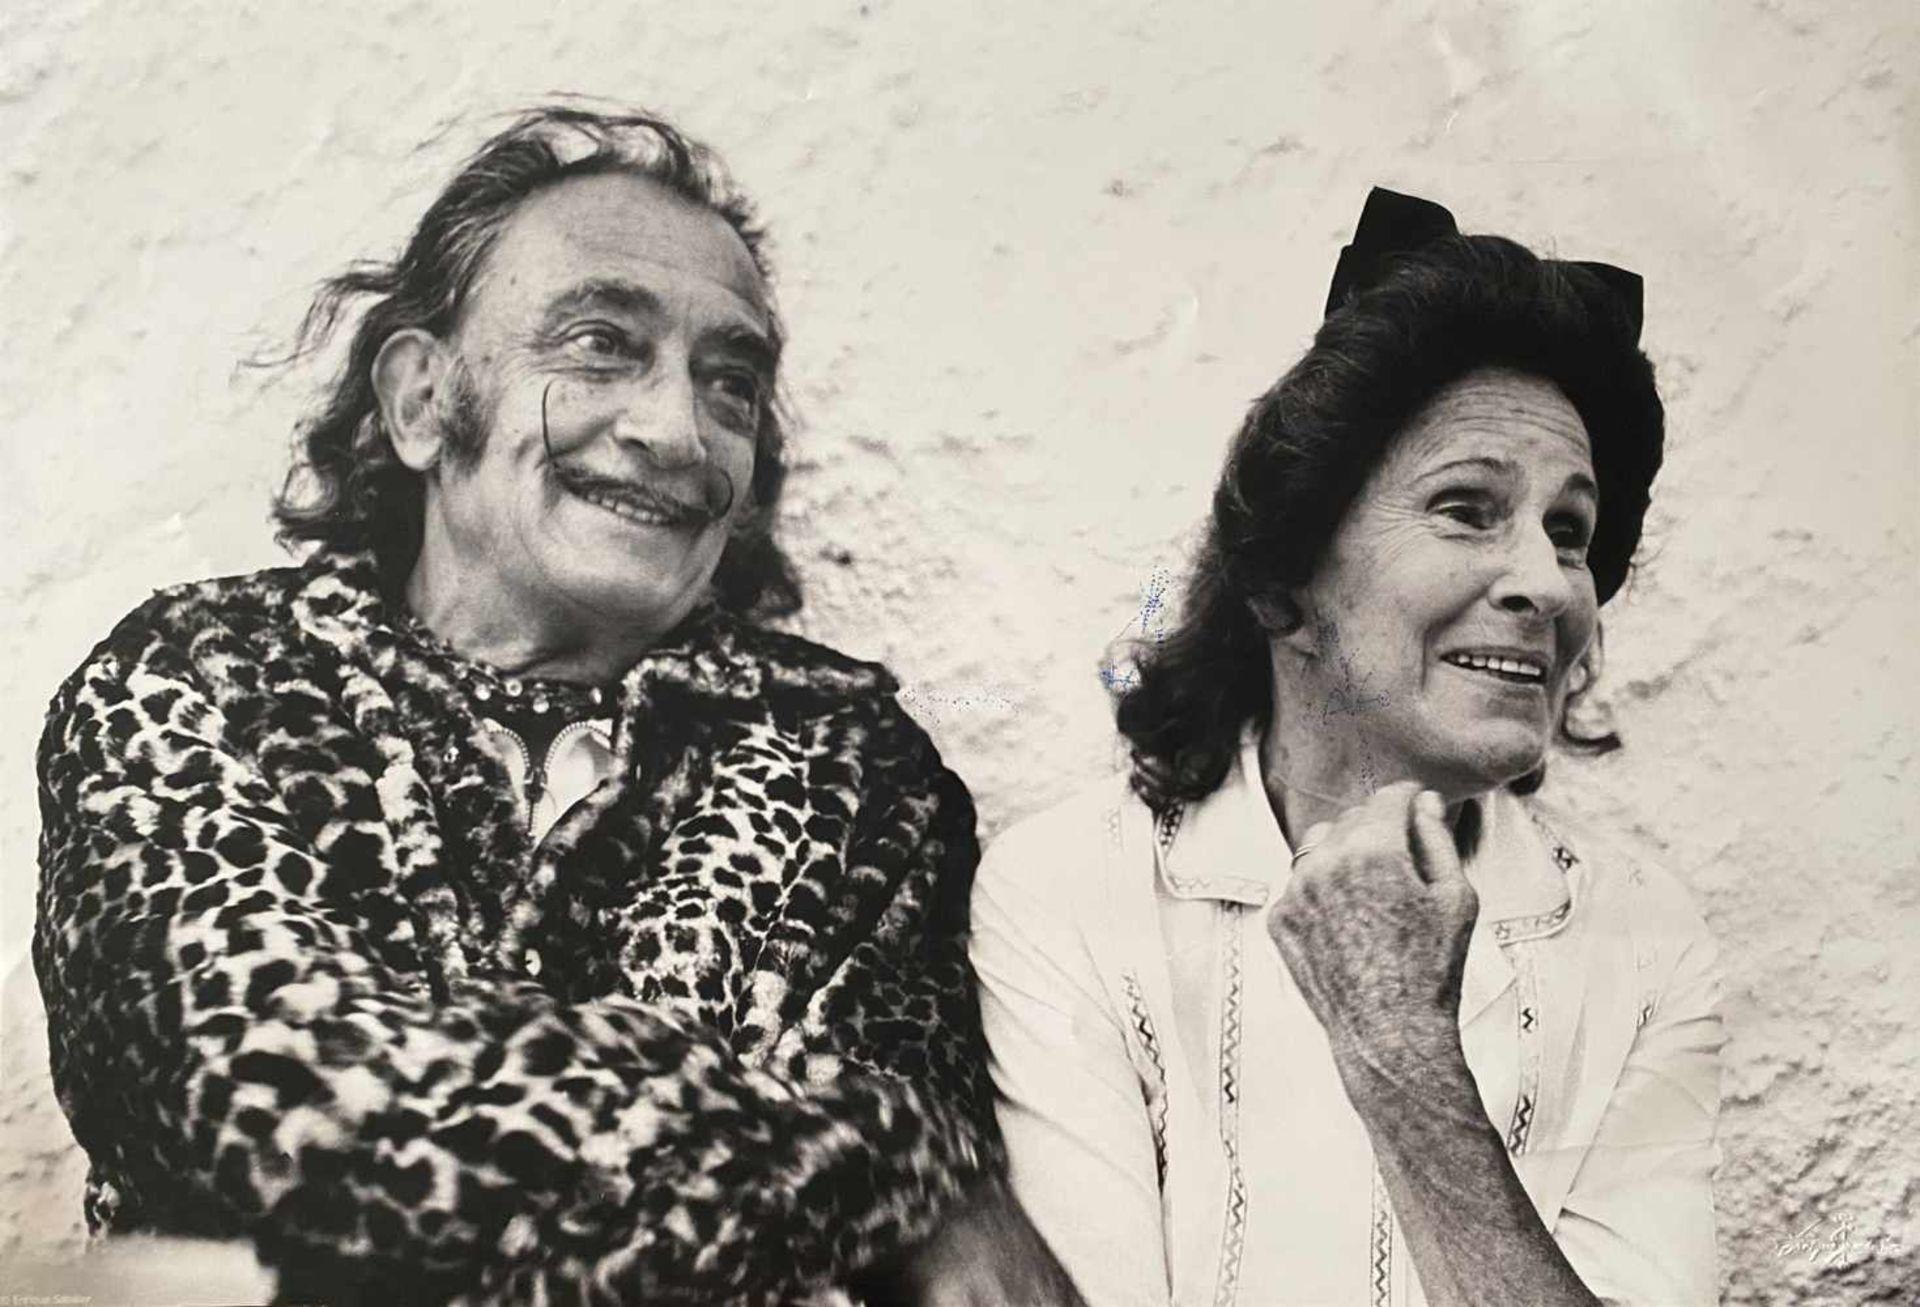 Los 13C - Salvador Dalí (Figueres, 1904 - 1989) Salvador Dalí (Figueres, 1904 - 1989) Great photography of